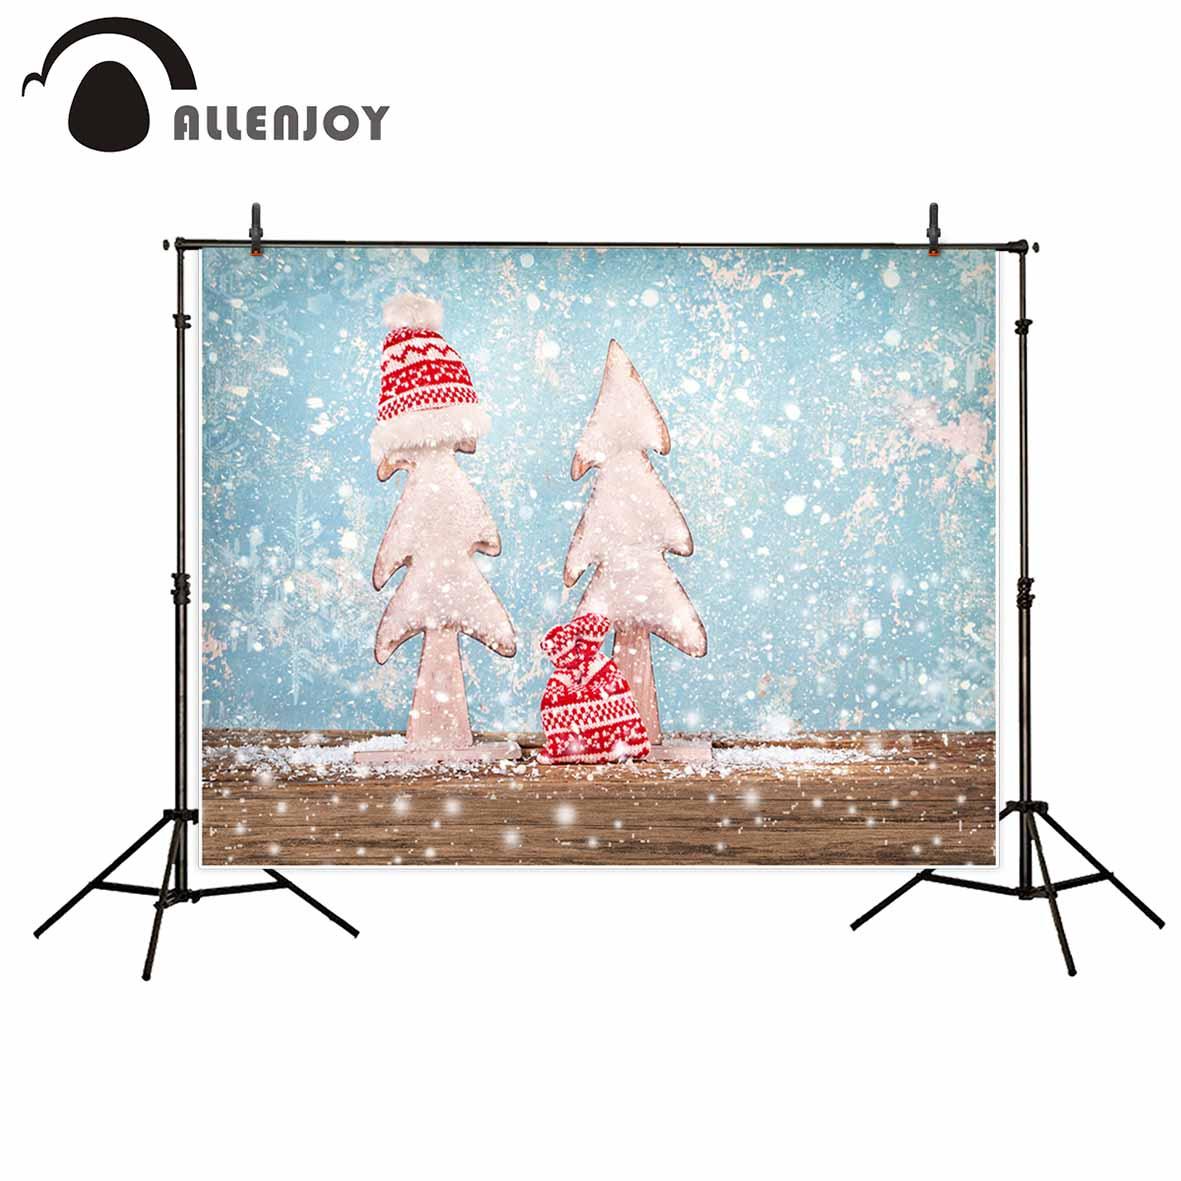 Allenjoy photography Christmas background snowflakes hat wooden floor cute children background backdrop kids